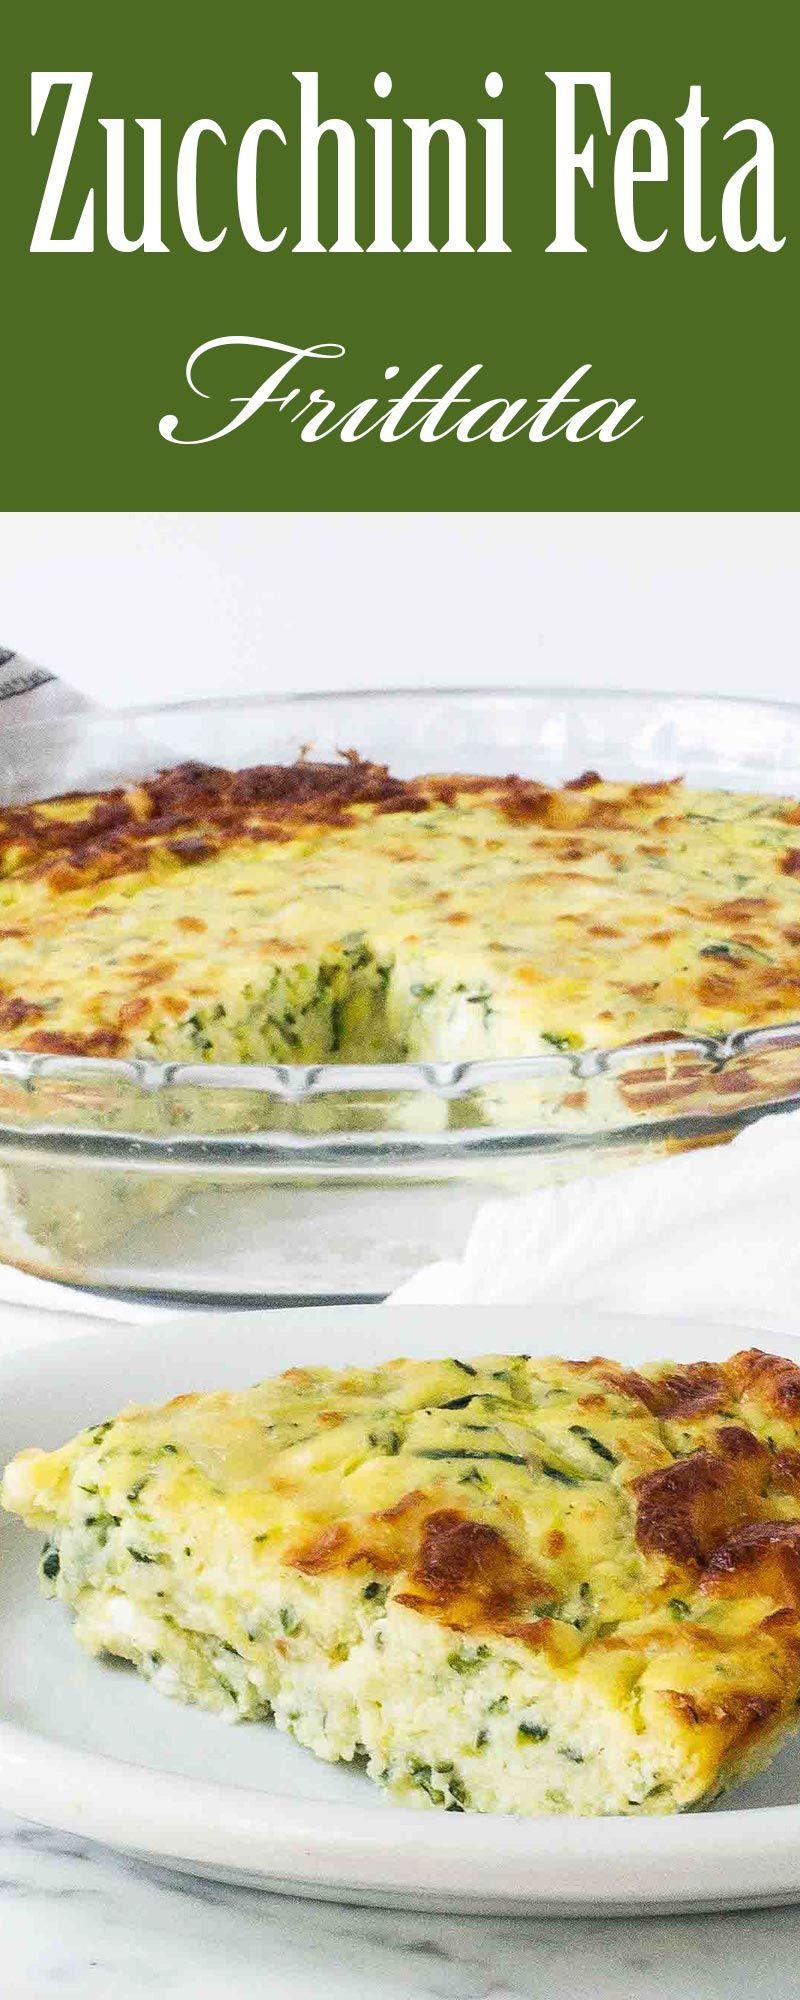 Zucchini Feta Frittata Vegetarian And Gluten Free